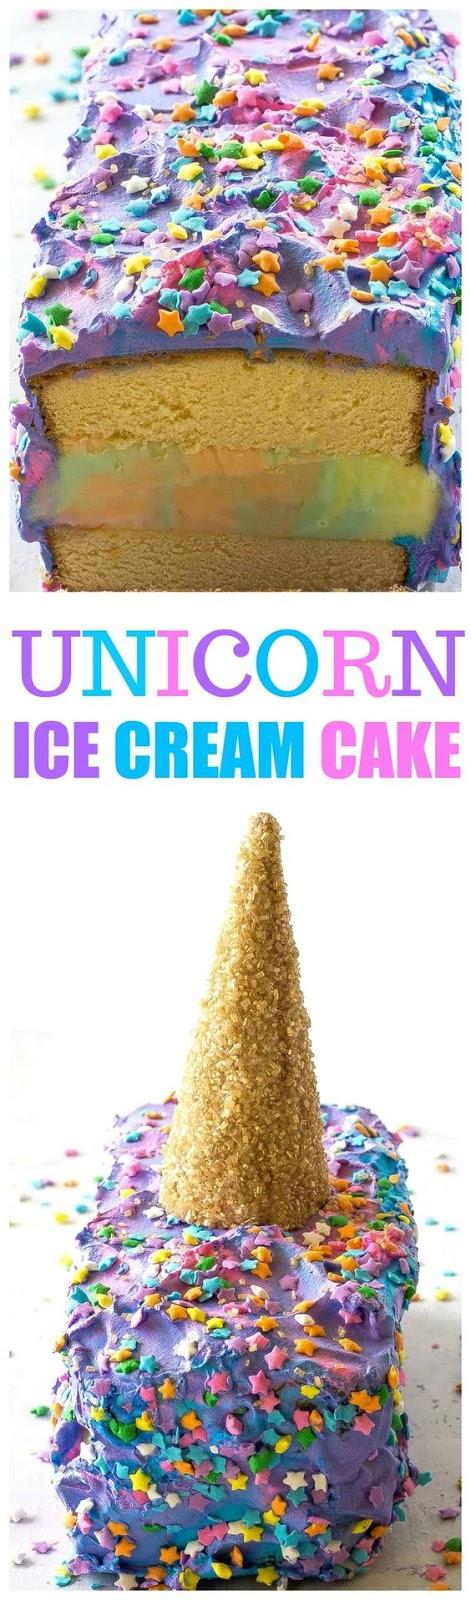 Unicorn Ice Cream Cake